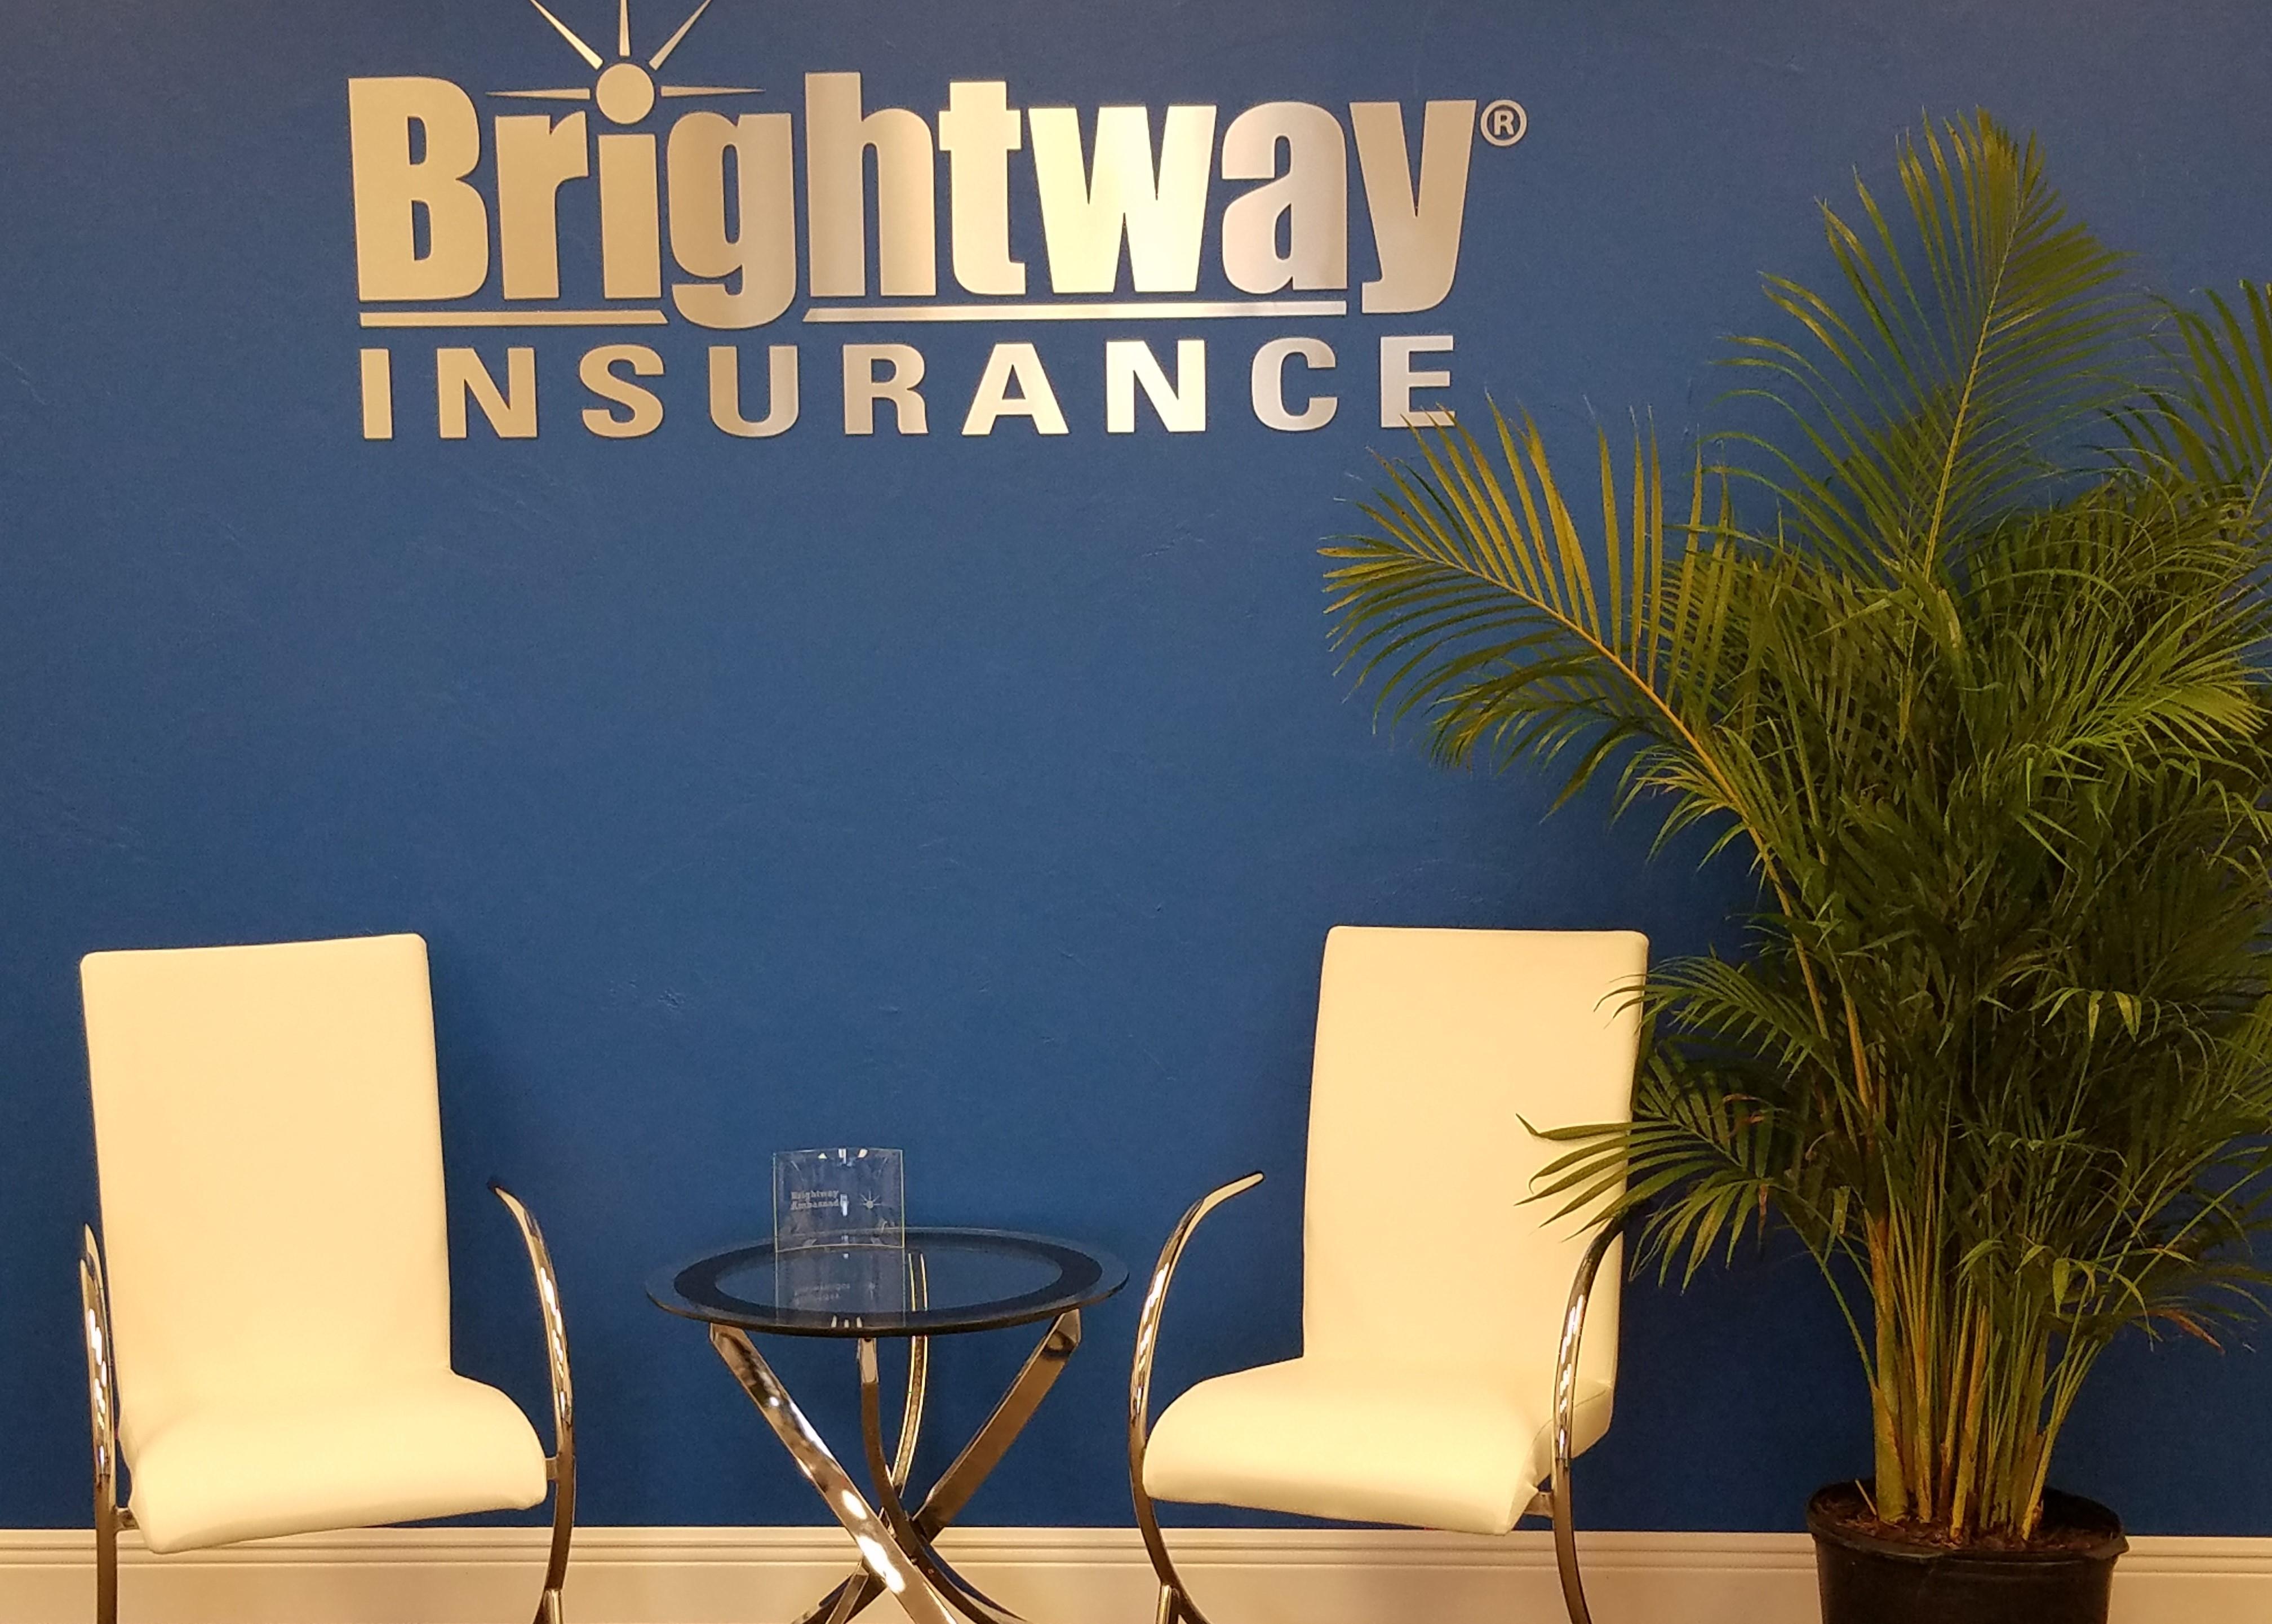 Brightway, The Seuffert Agency image 5